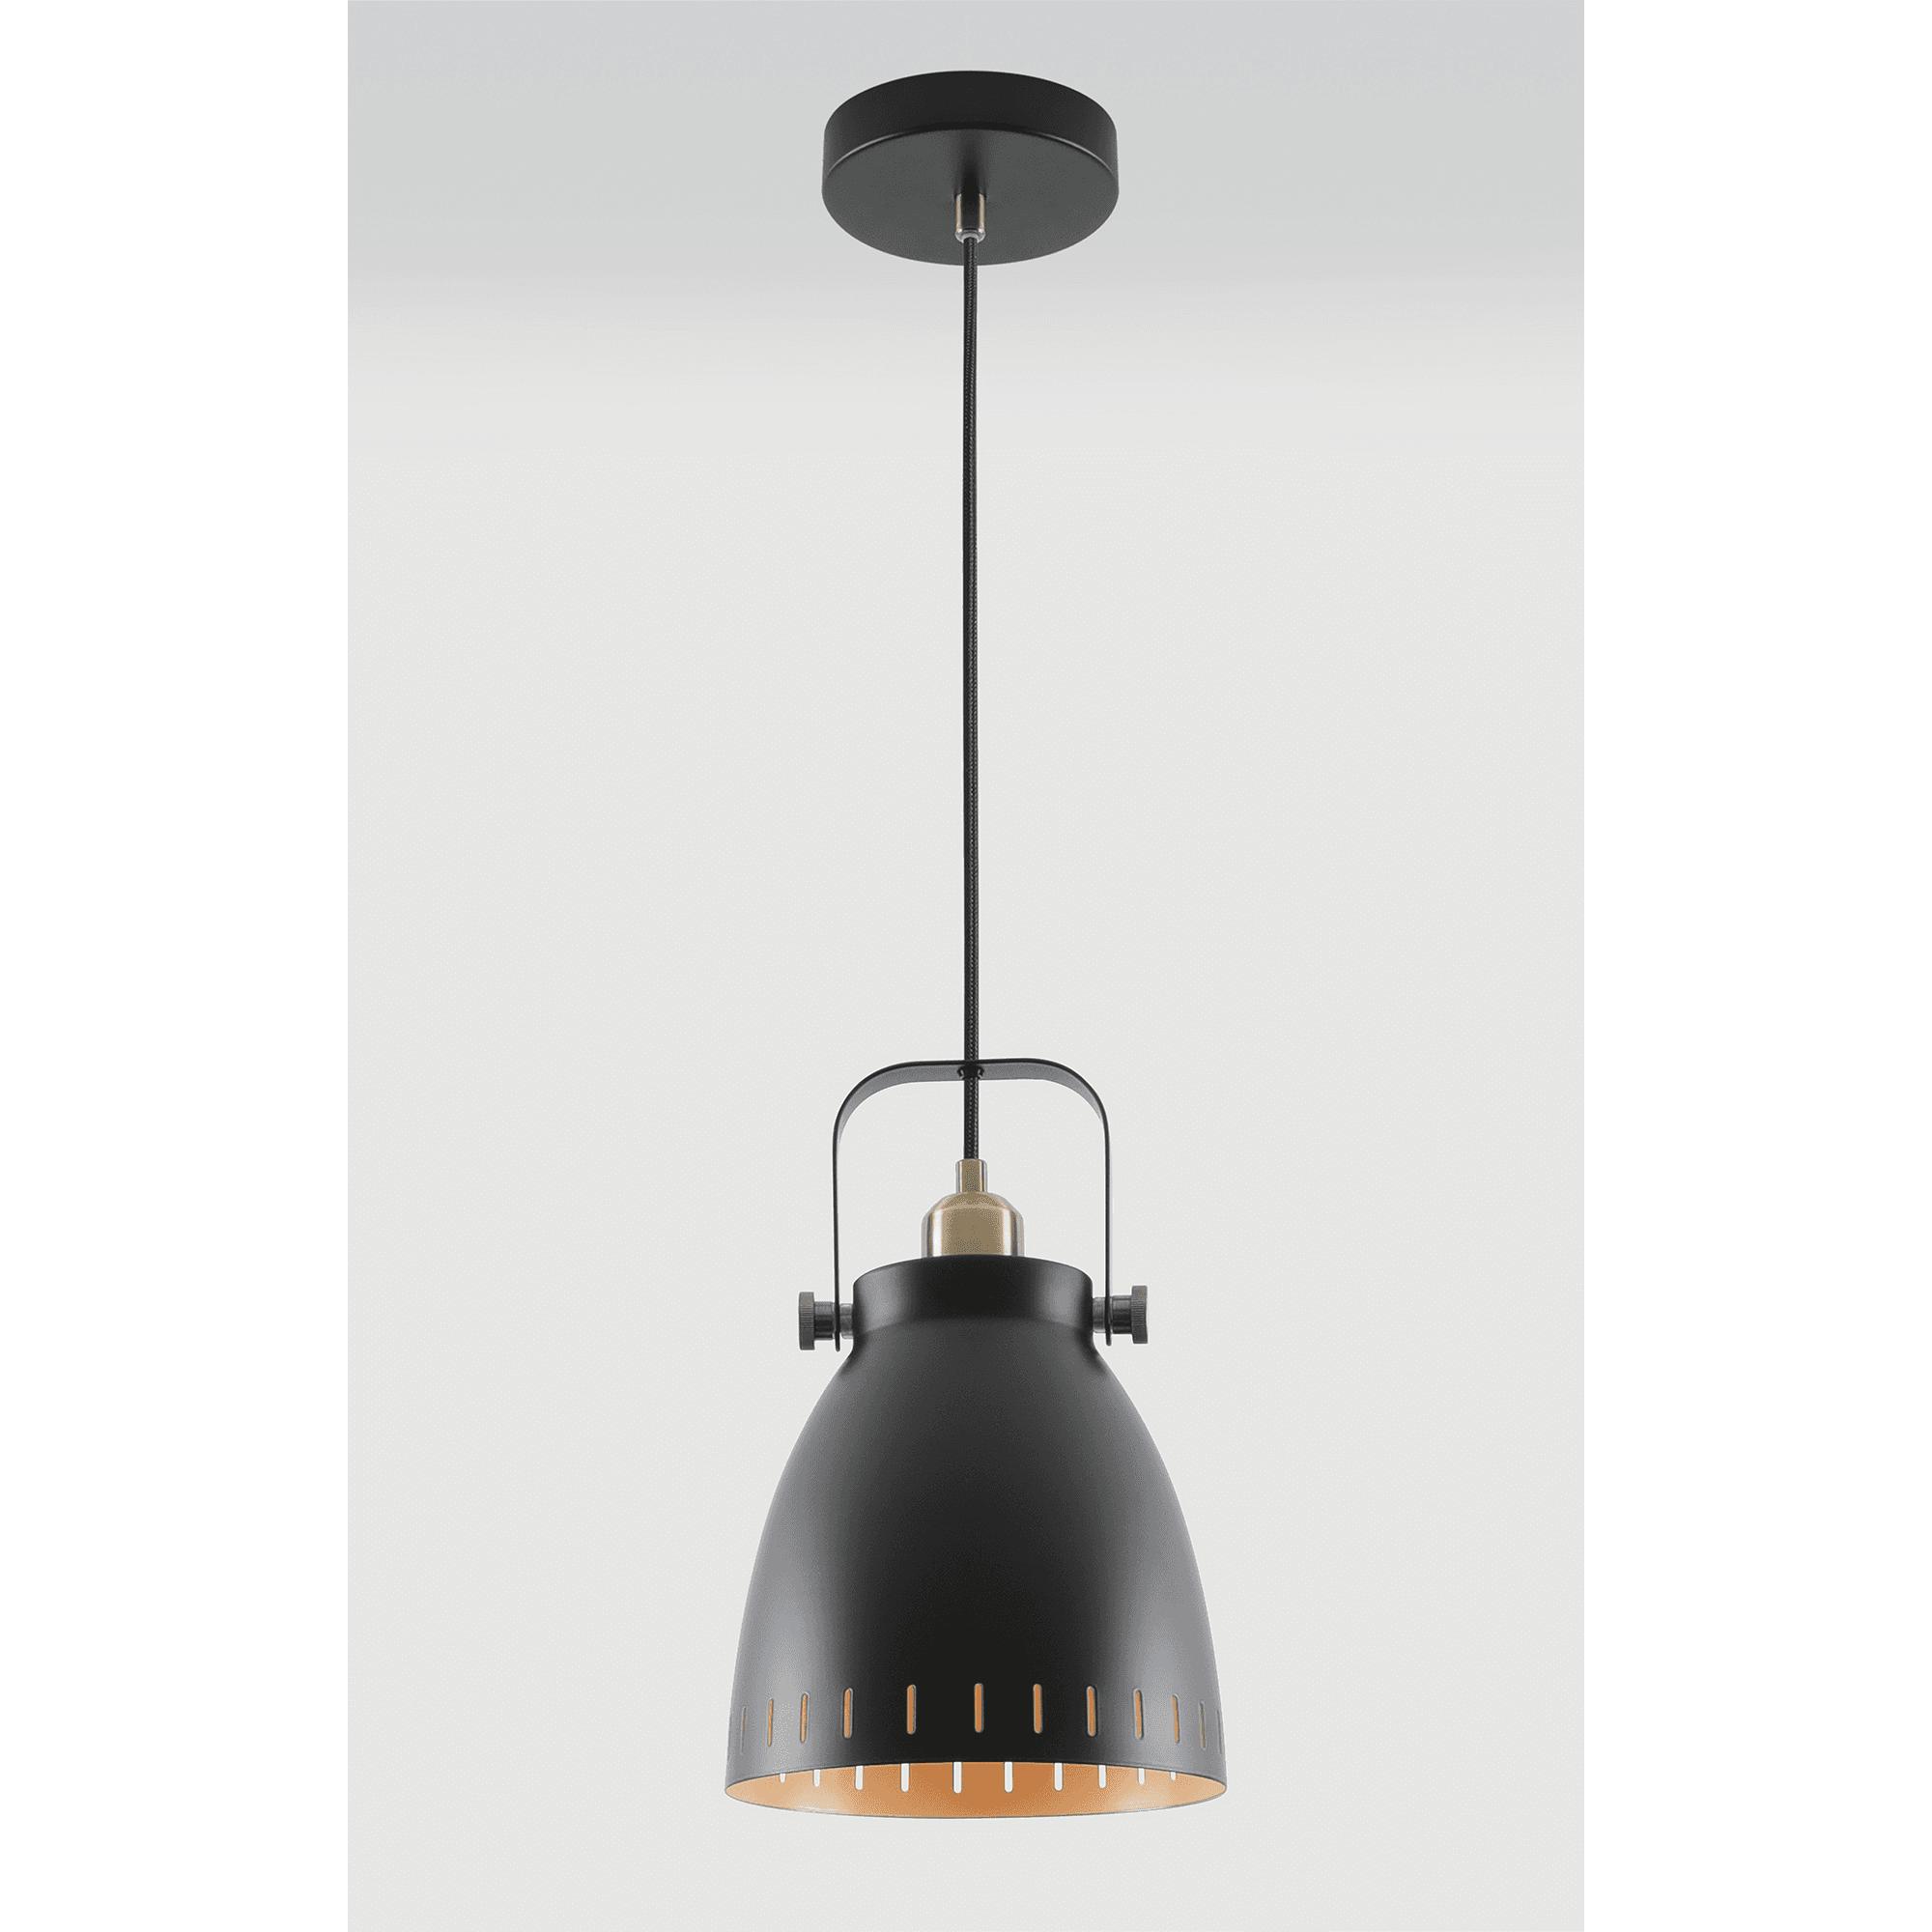 Discovery Lighting Volta Single Light Medium Ceiling Pendant In Black Finish Castlegate Lights